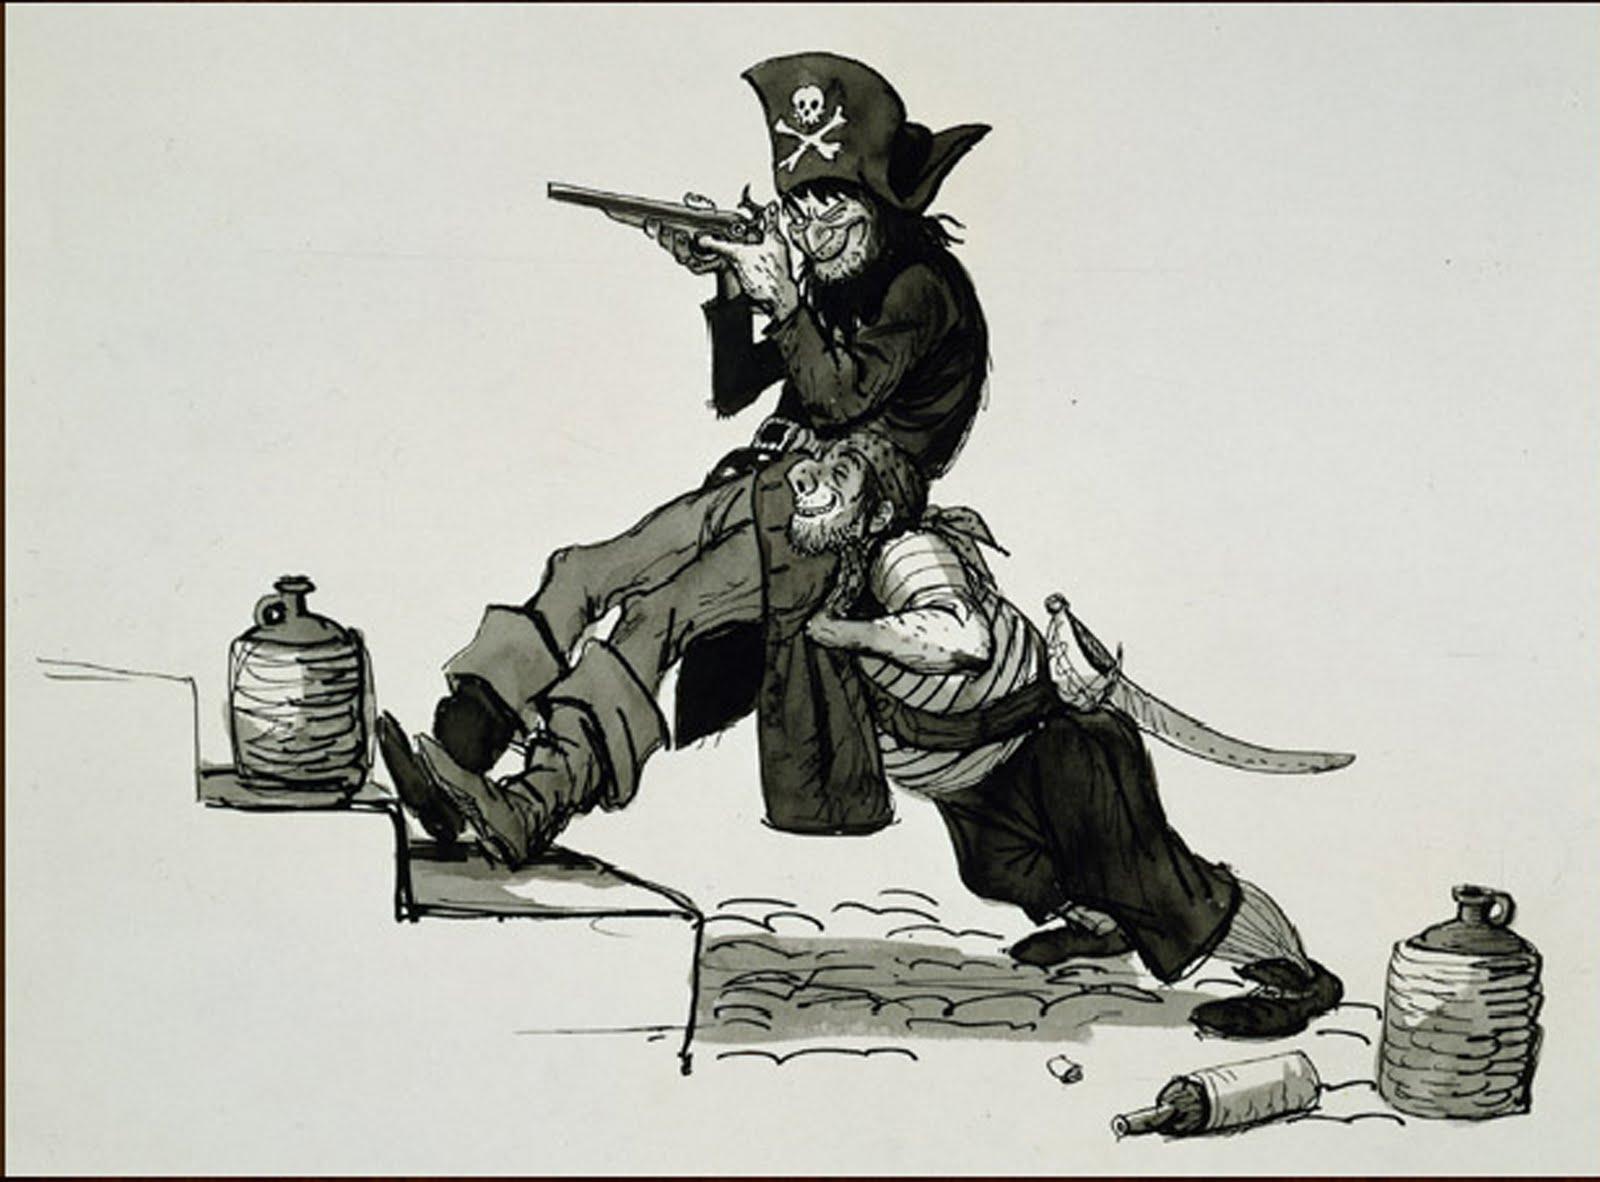 Pirates Of The Caribbean clipart marc davis #15